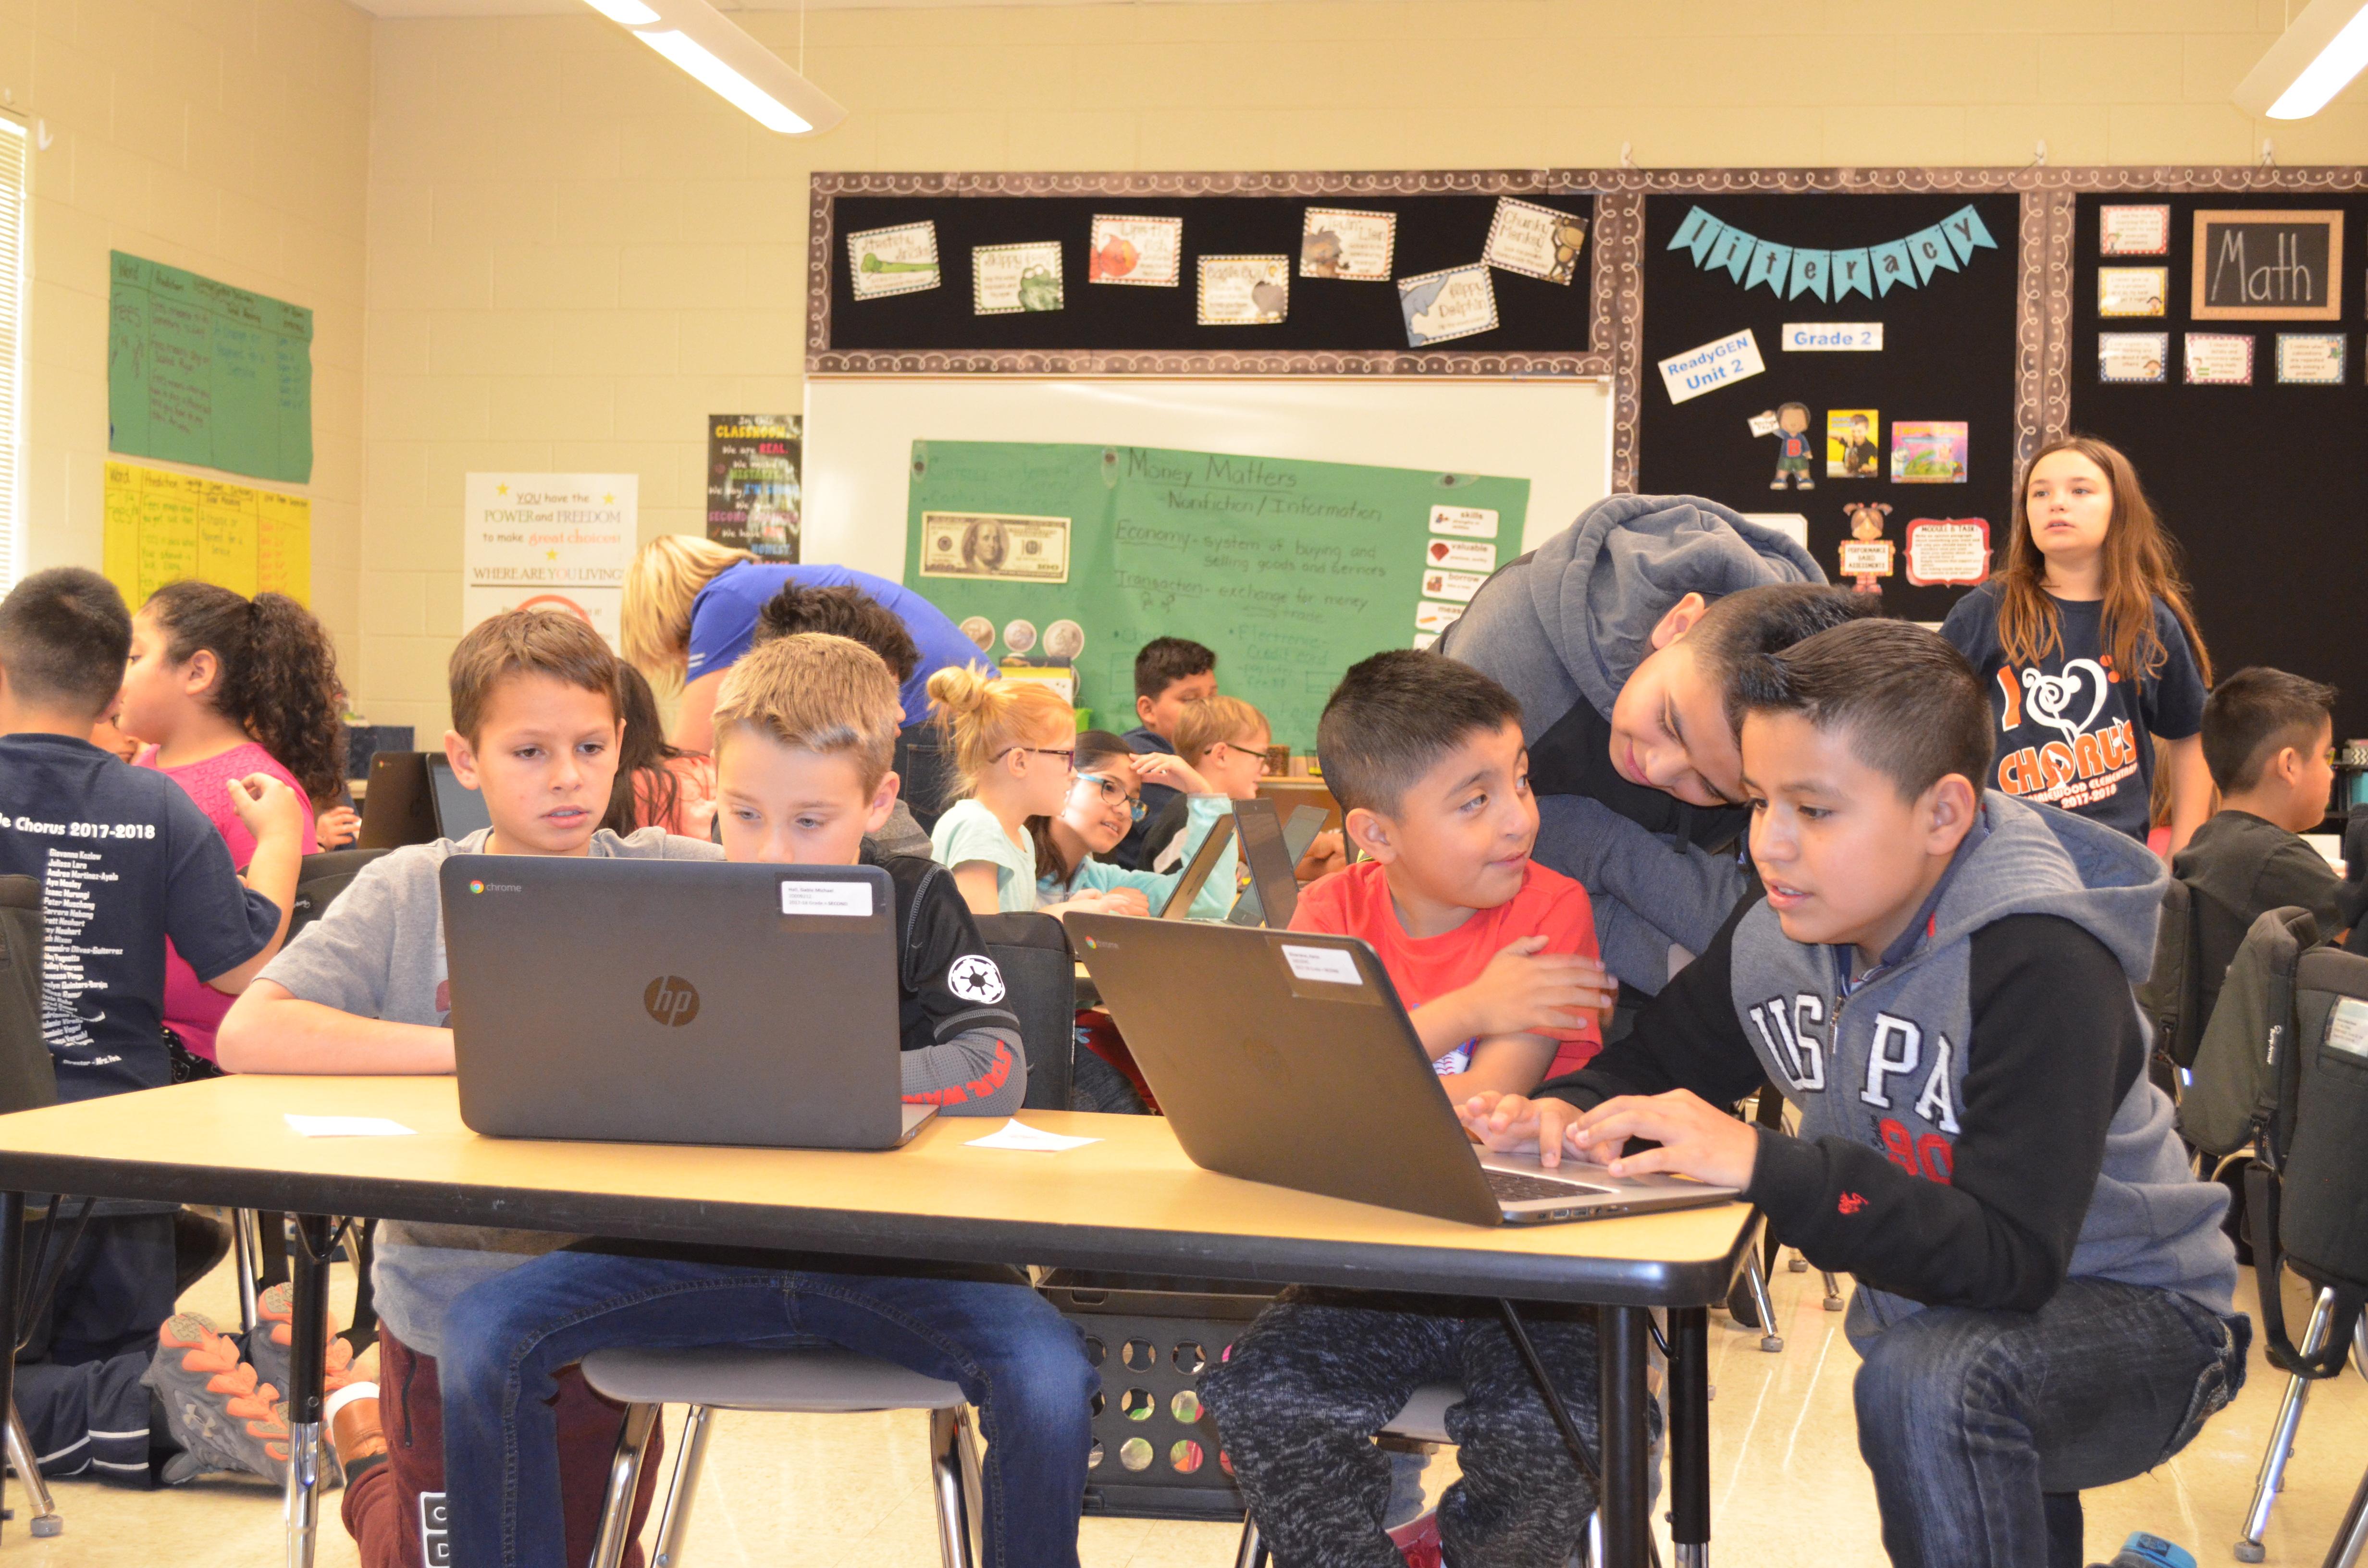 Hour of Code at Prairiewood Elementary